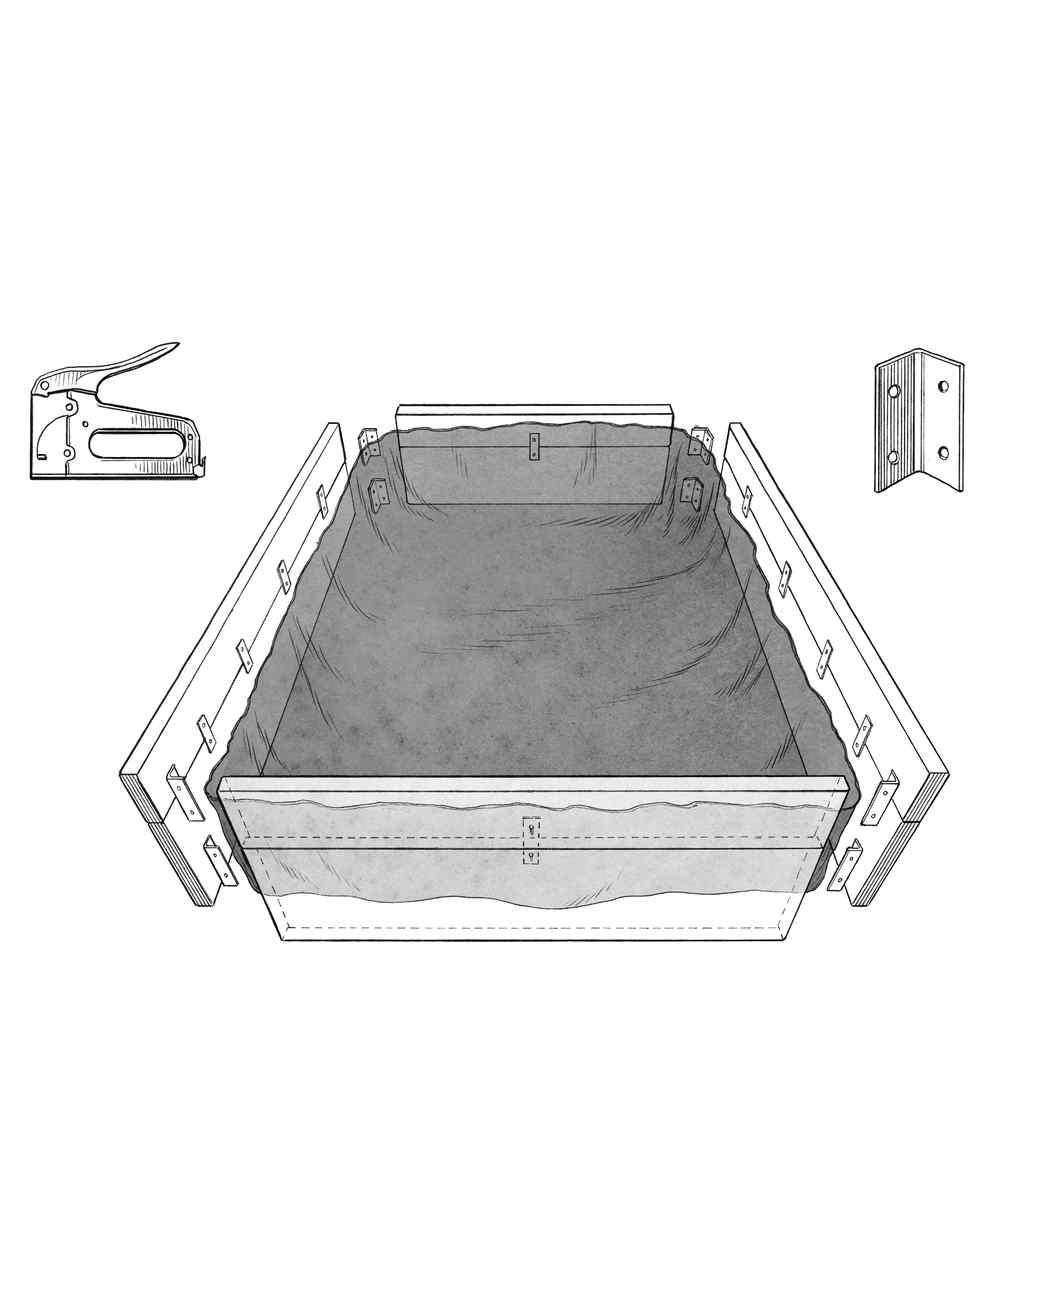 hight resolution of how to build a raised garden bed martha stewart pallet raised garden bed diagram of raised garden bed